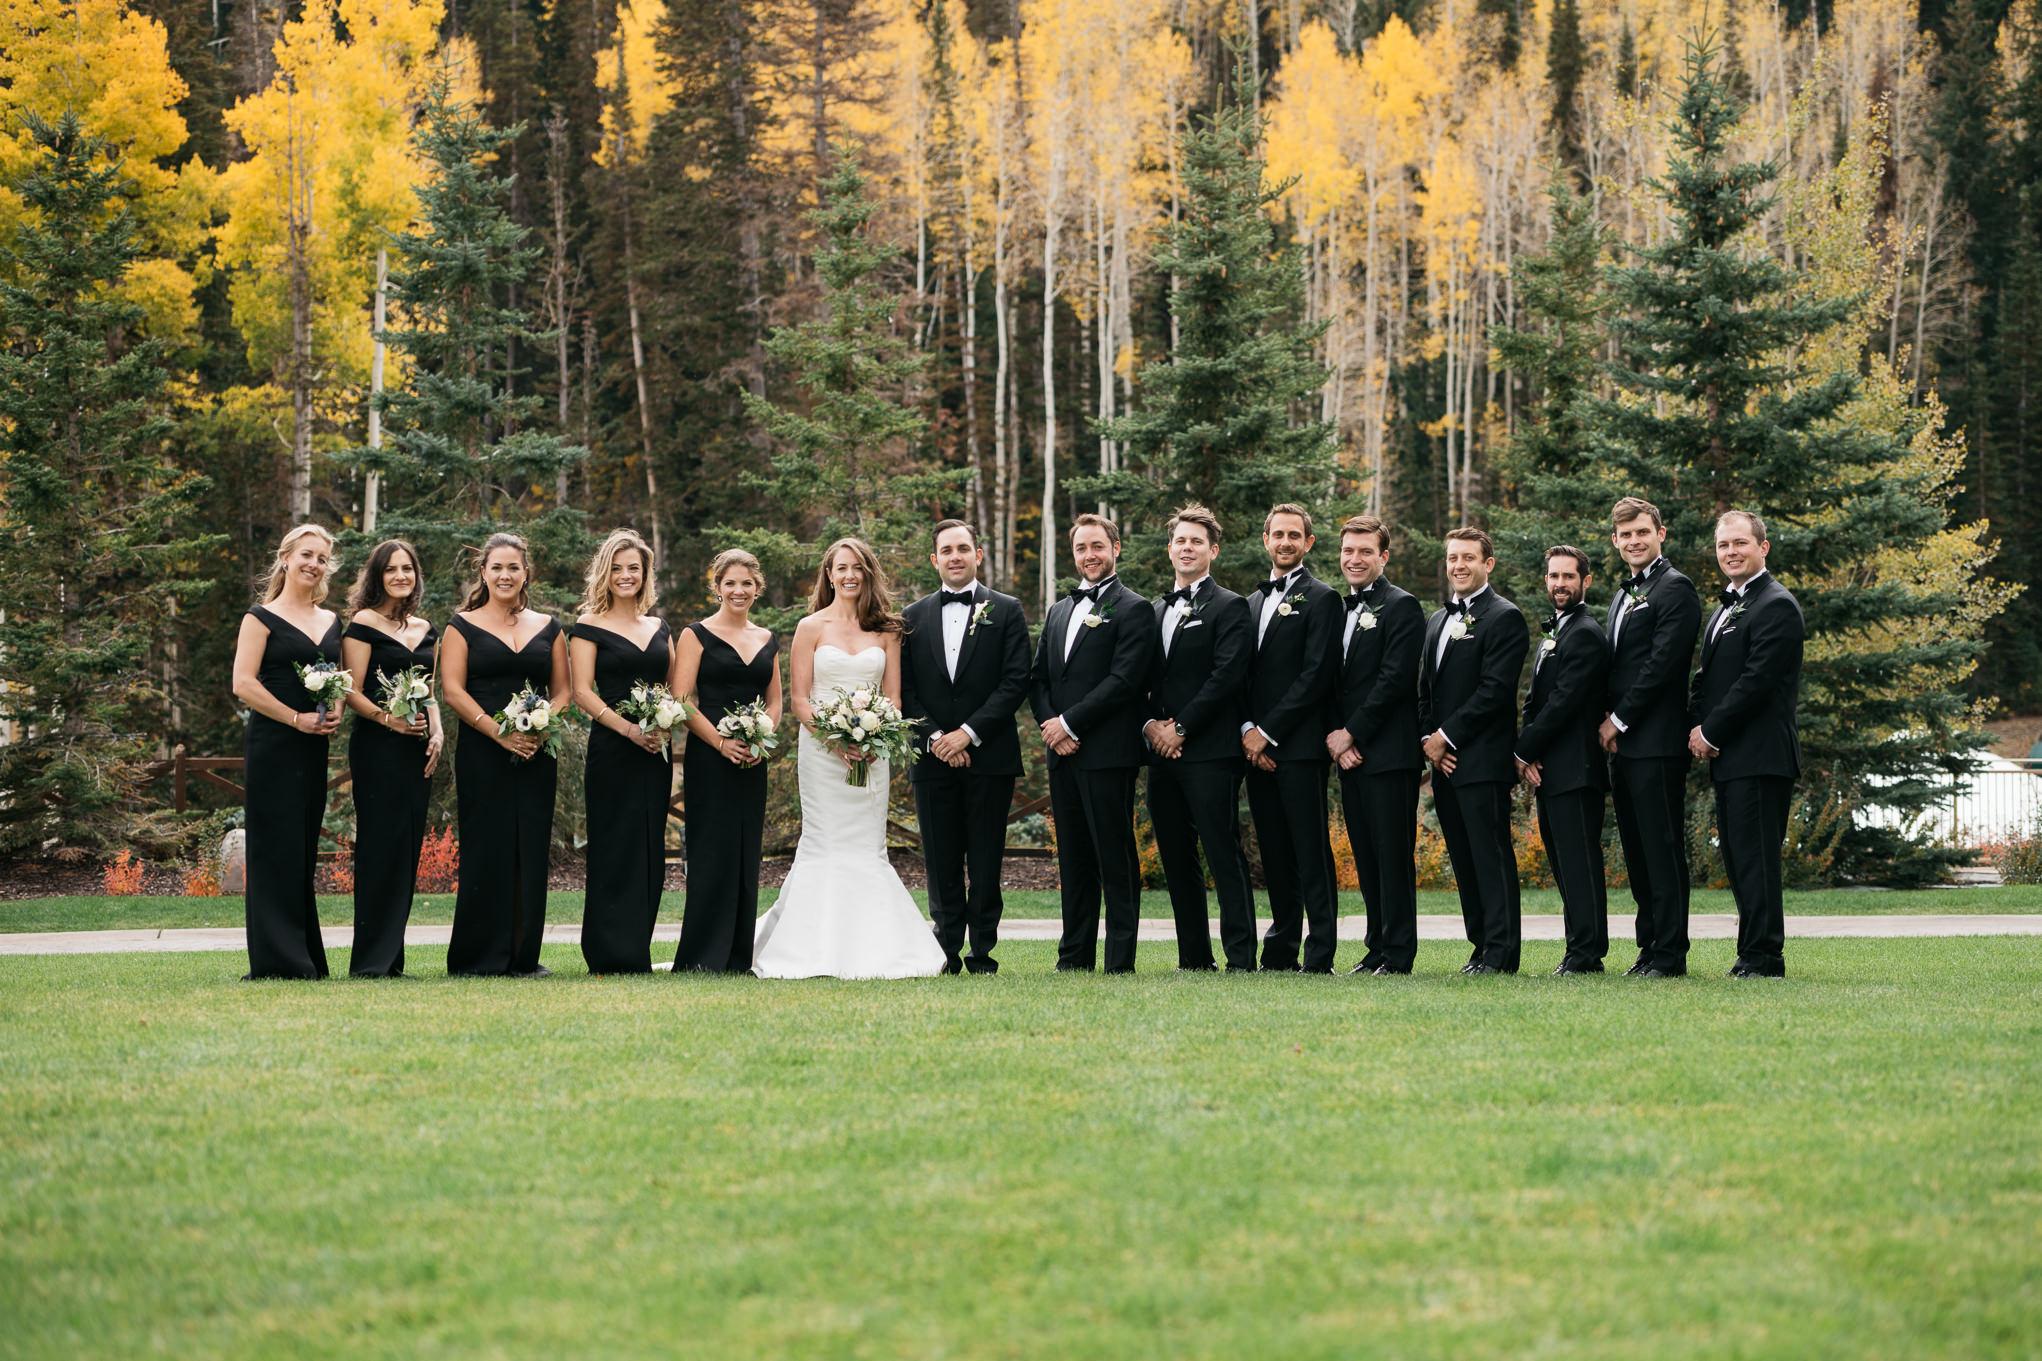 241_ONL_Mairin_Brian_Wedding_Trevor_Hooper_Photo.jpg